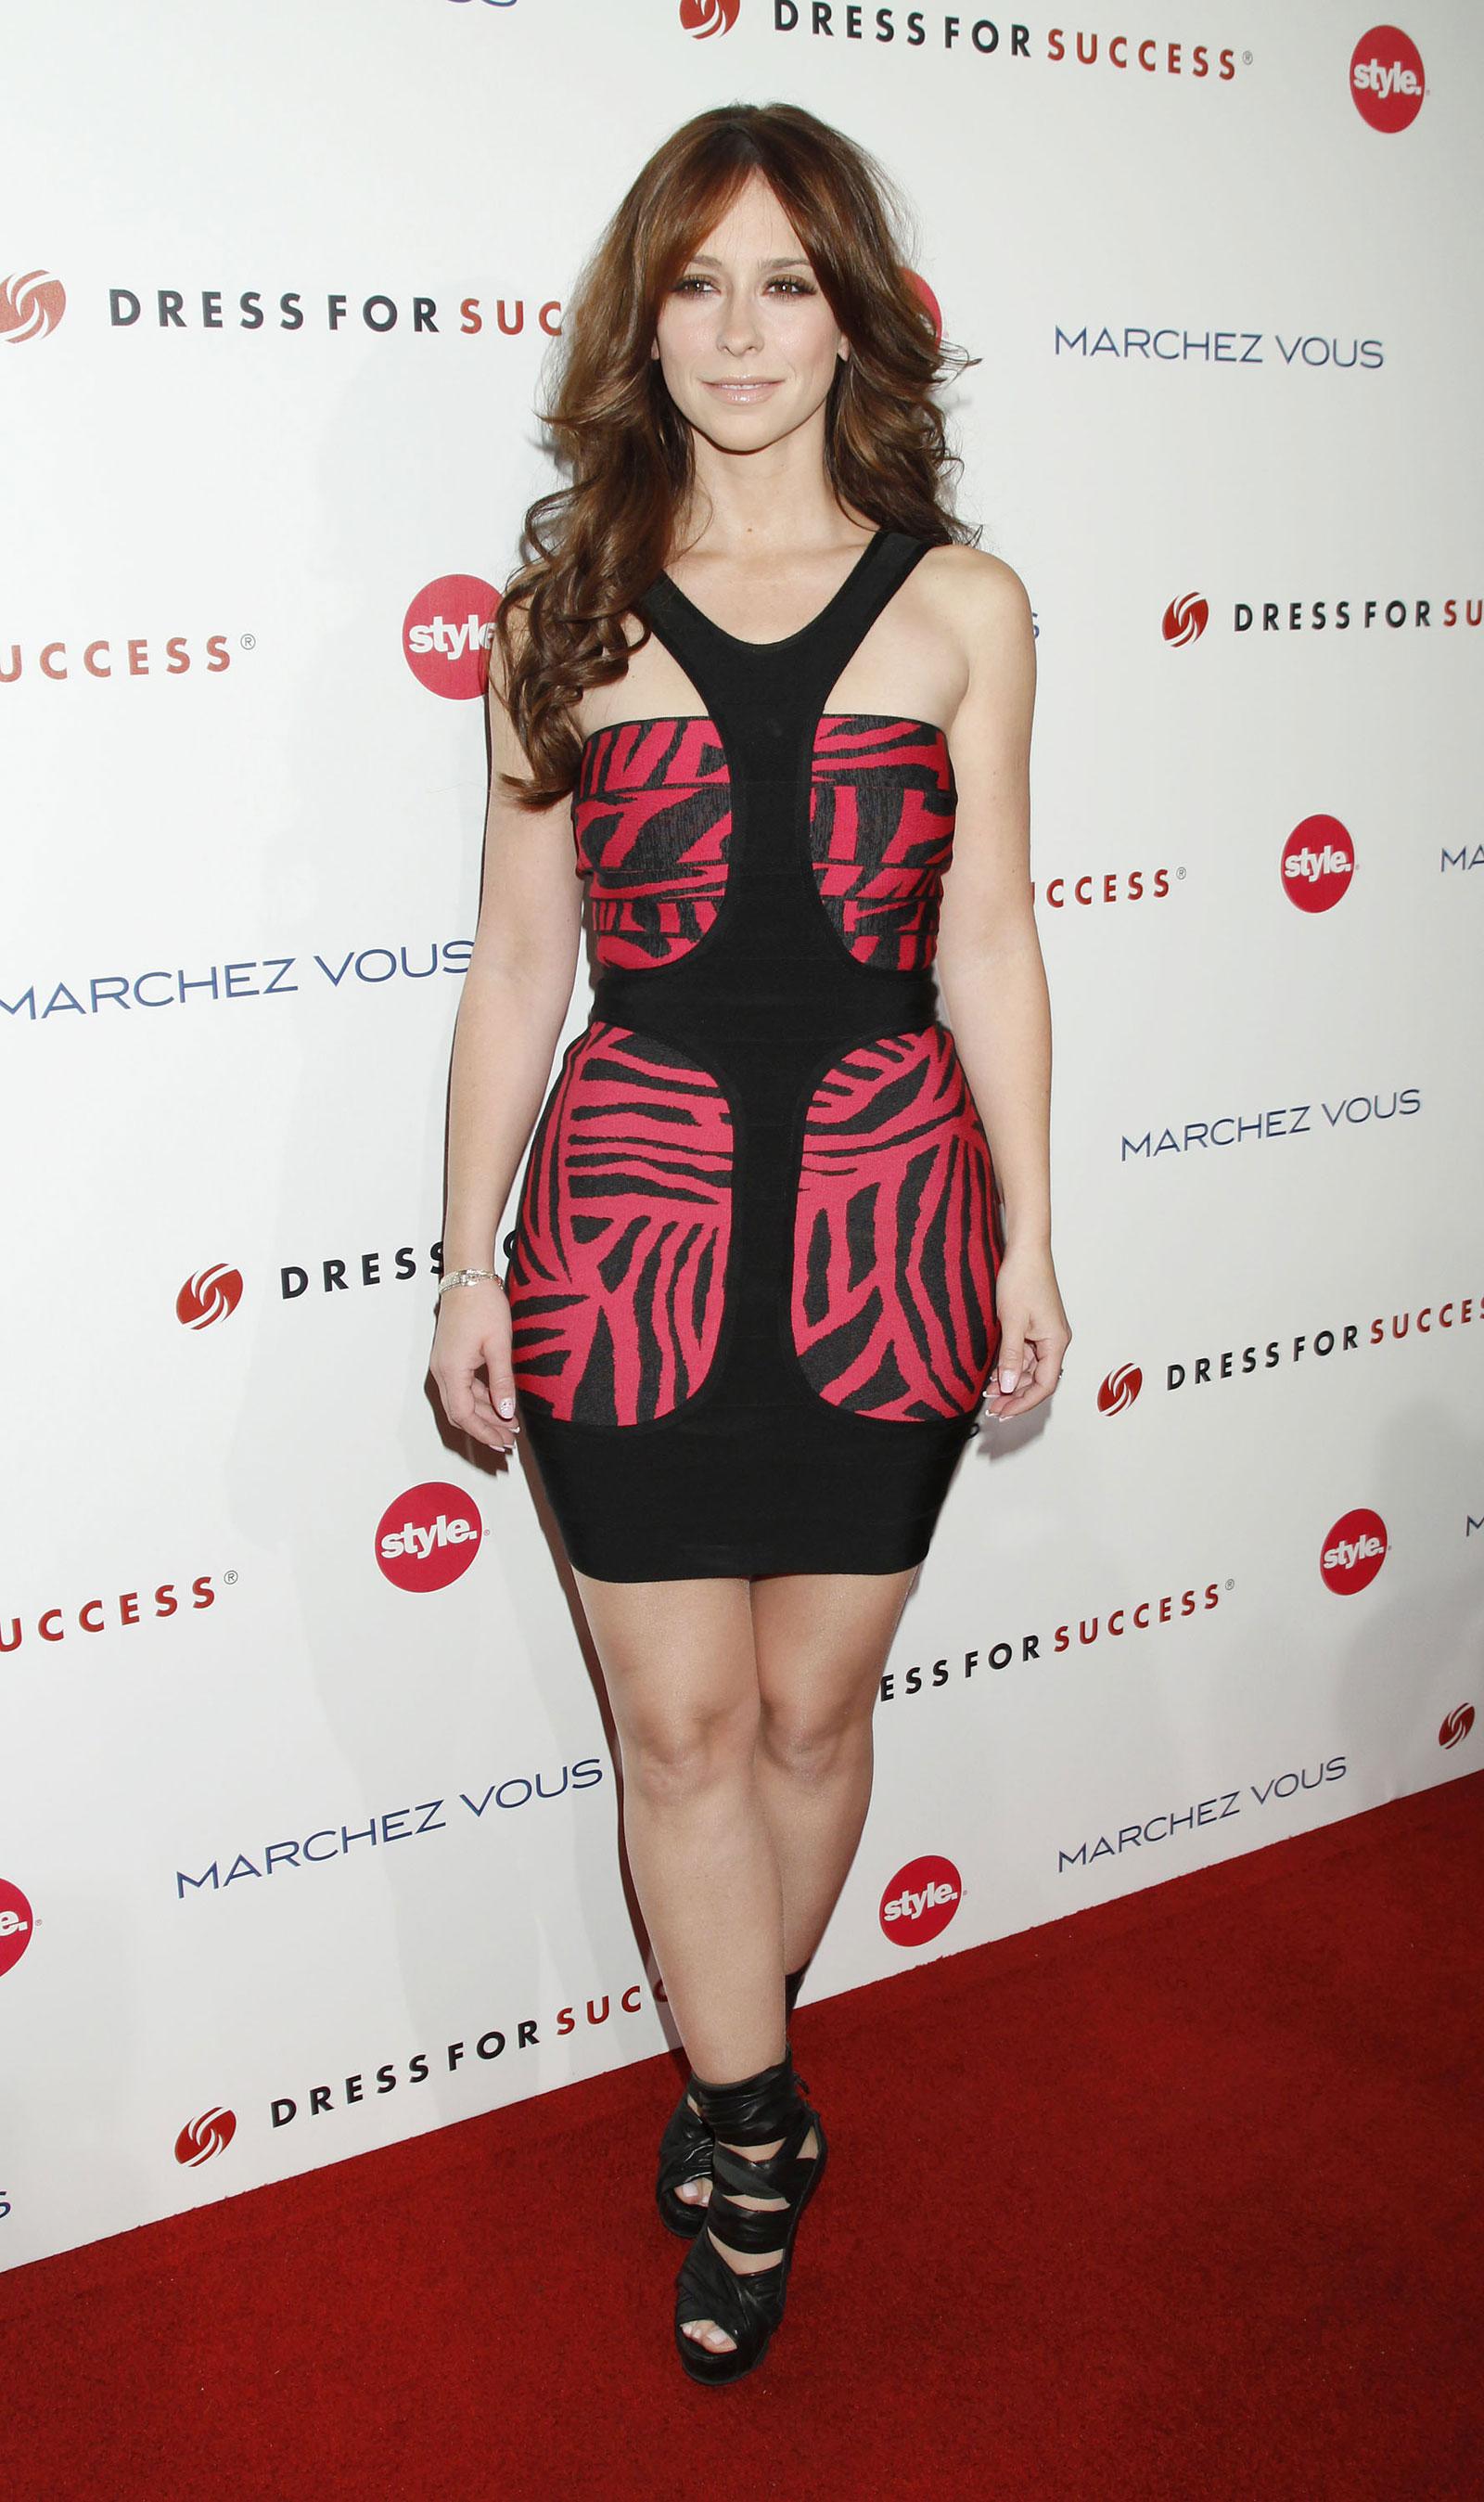 jennifer cohen offended dress for success